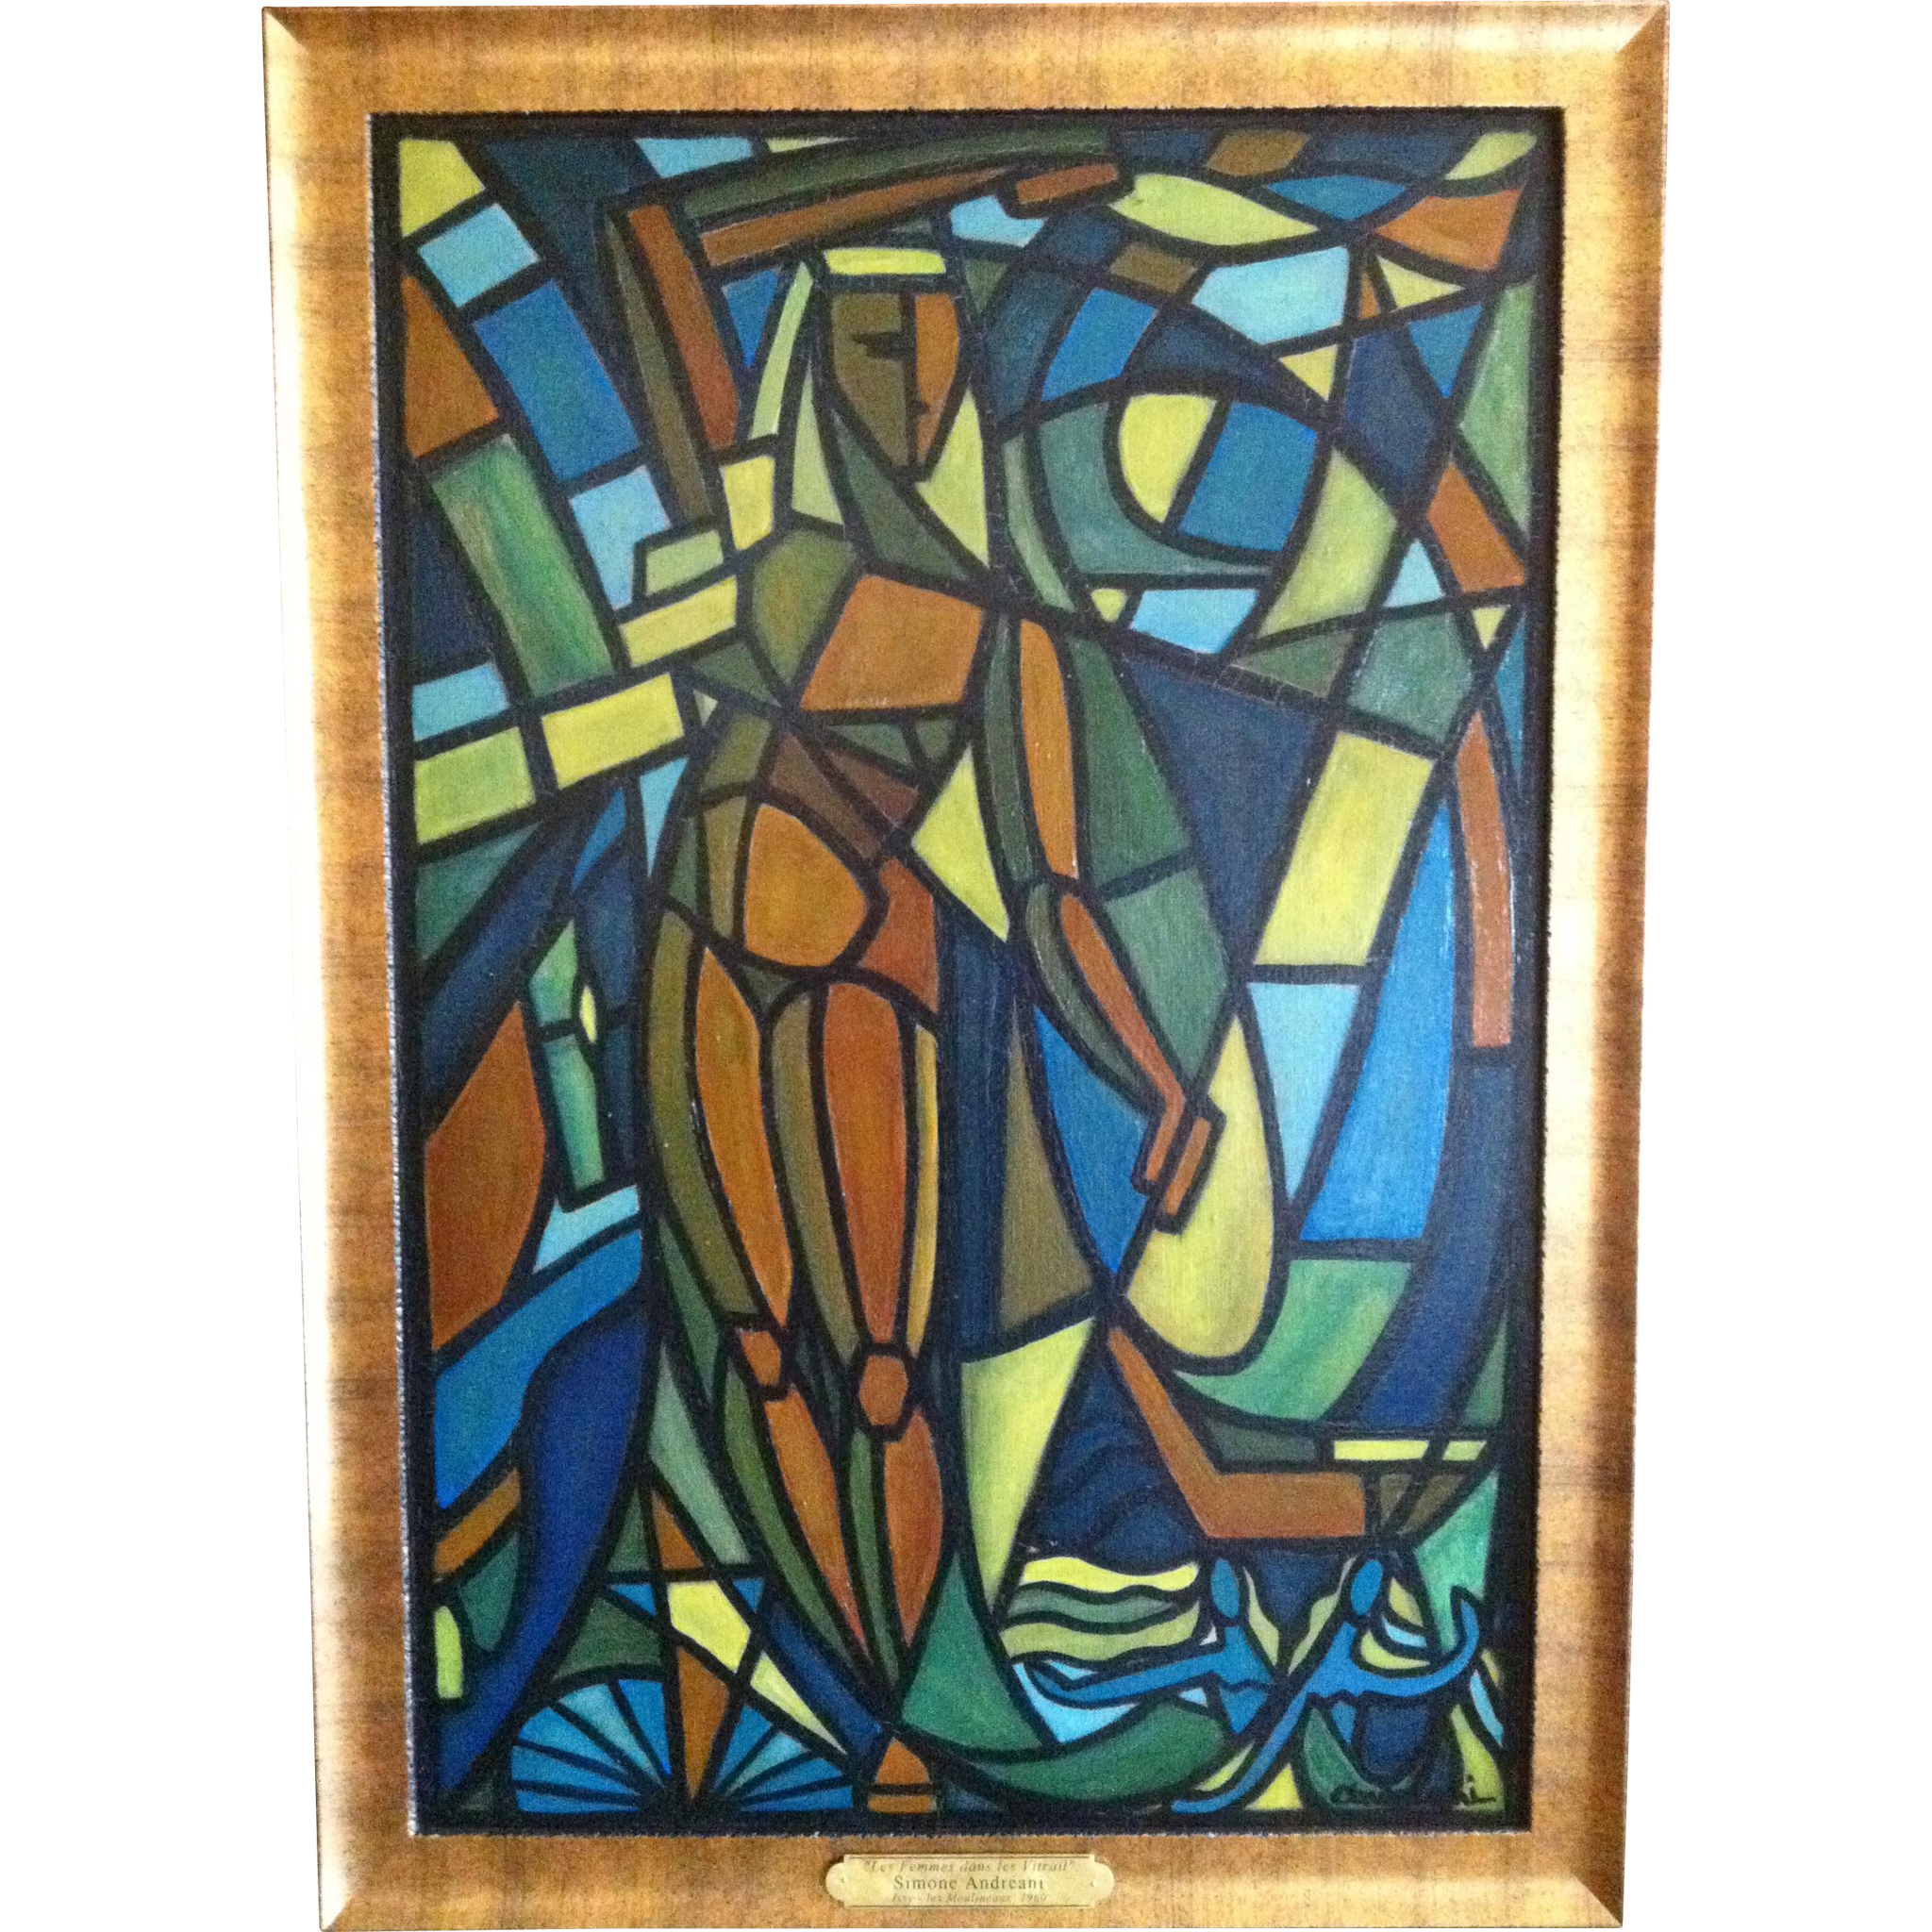 "Modernist Painting,French ""Les Femmes des Les Vitrail"", Simone Andreani, 1960's"